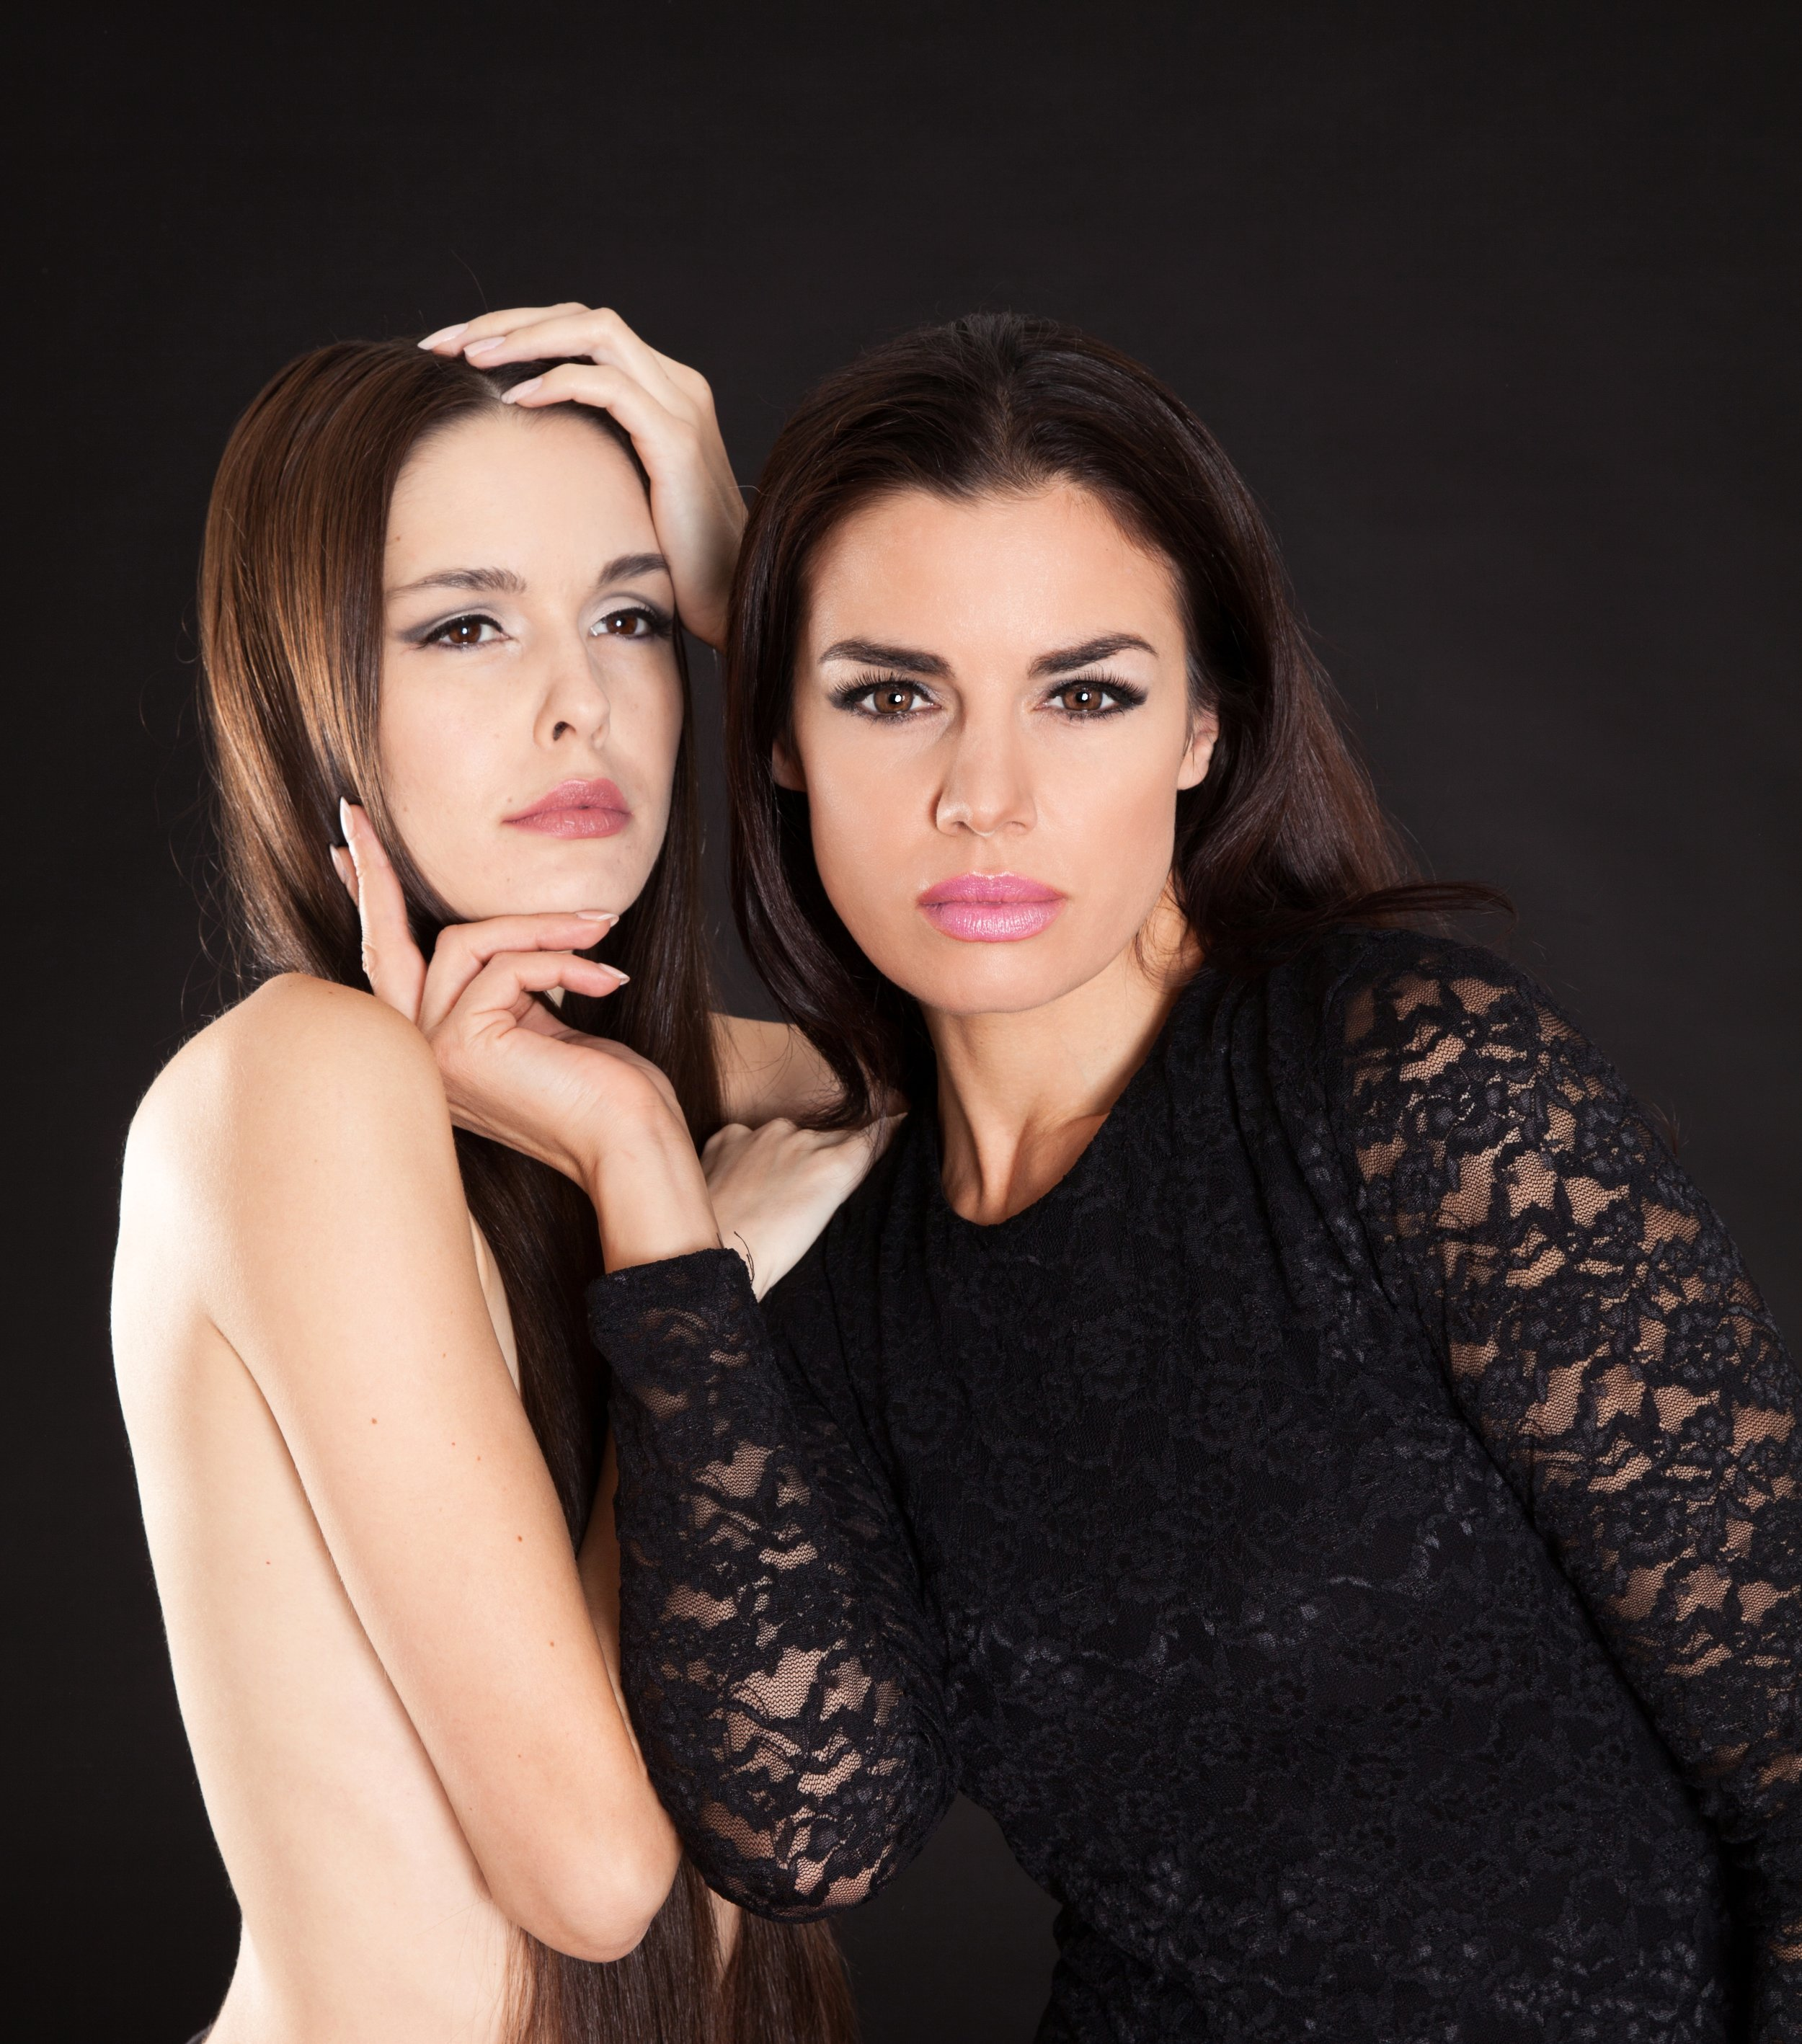 Christie and Neda 2 PP.jpg